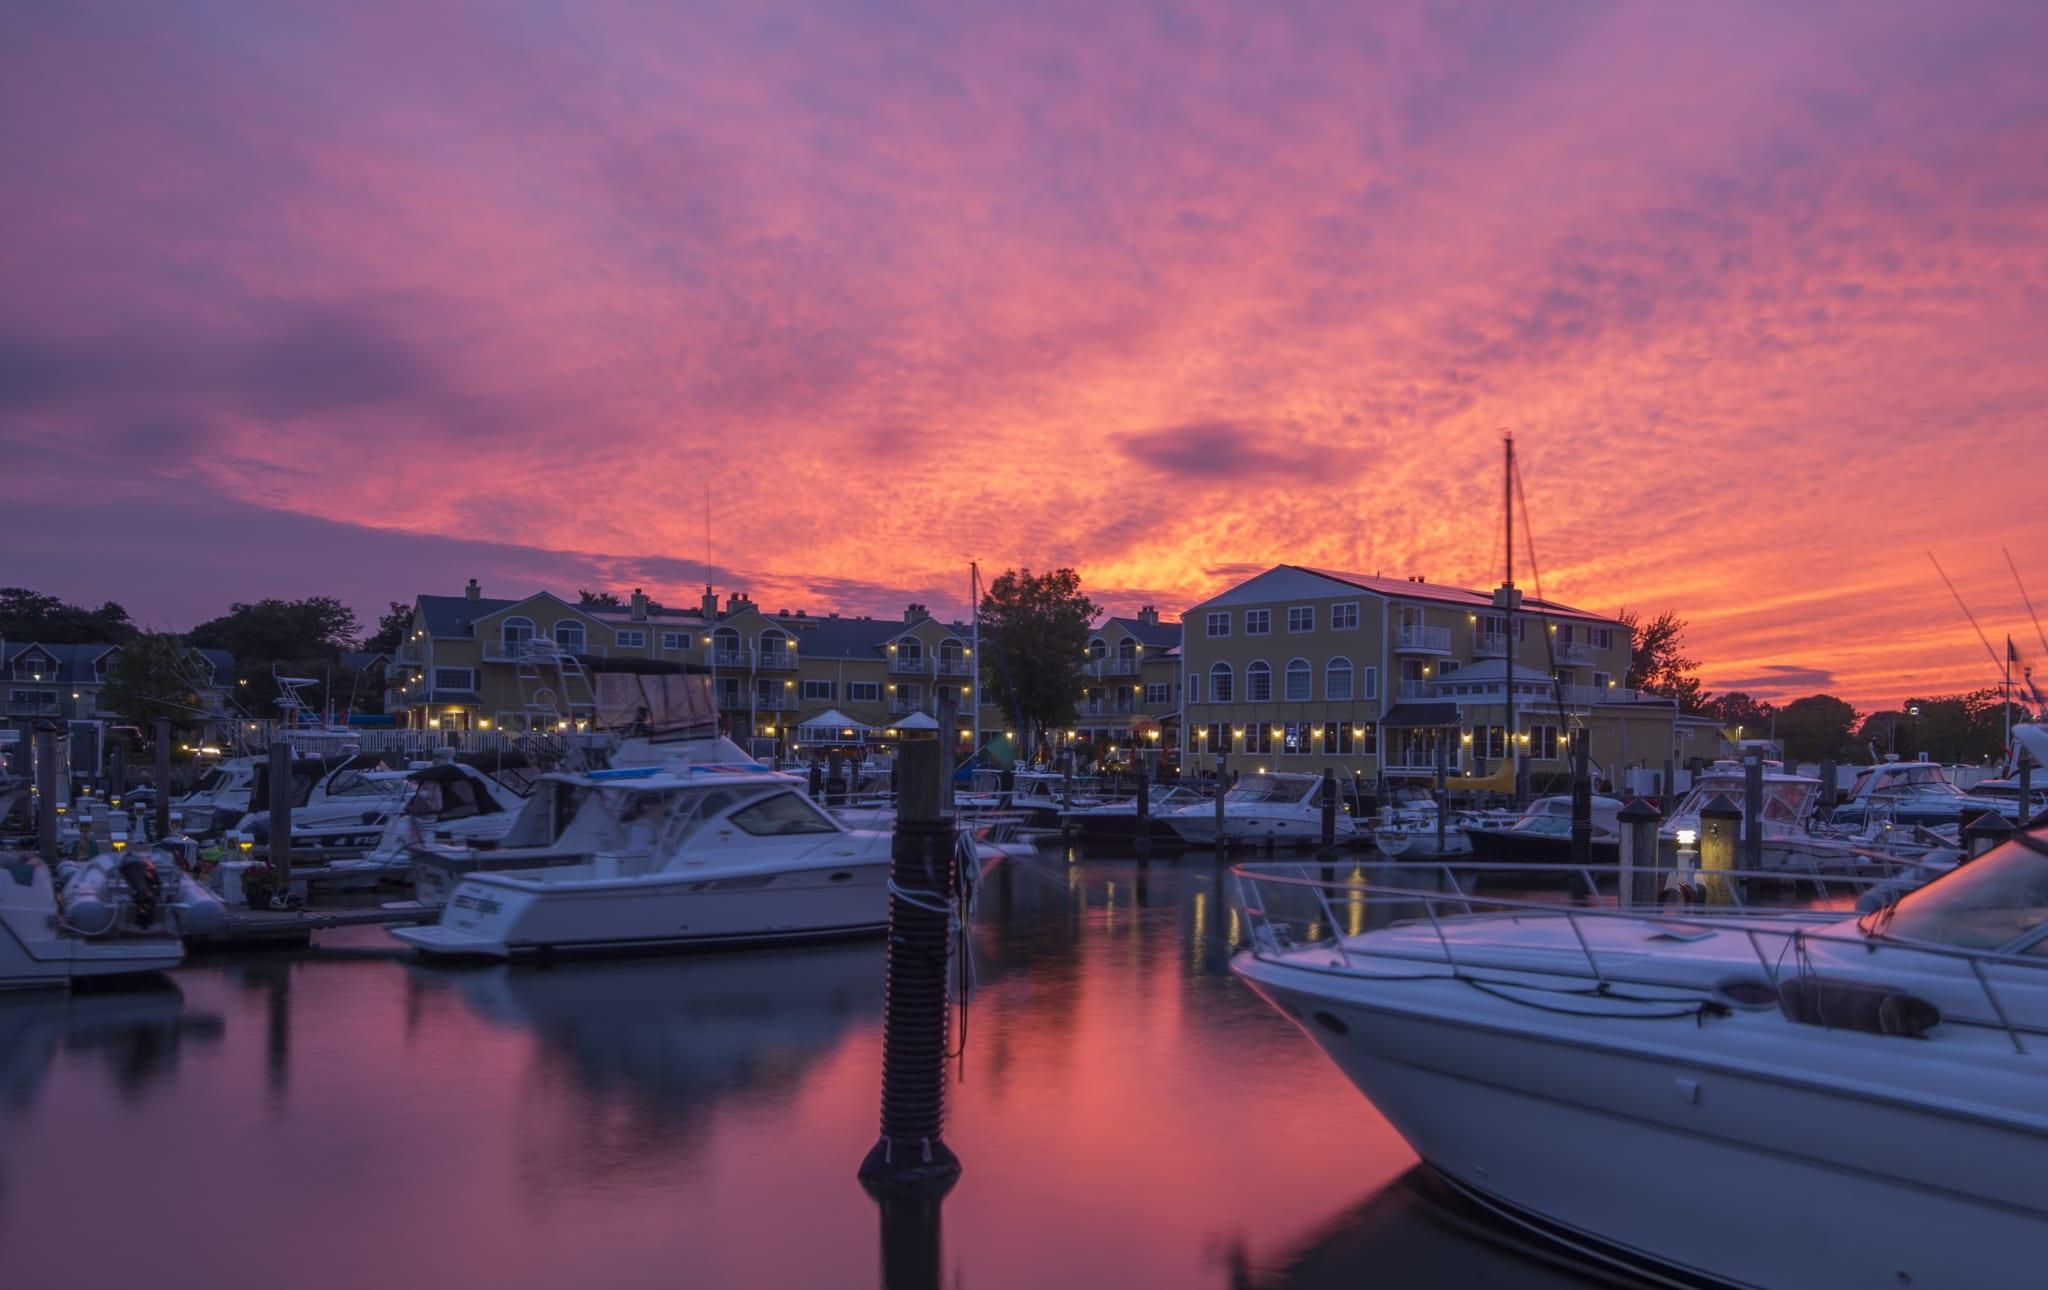 Boats in marina at sunset.